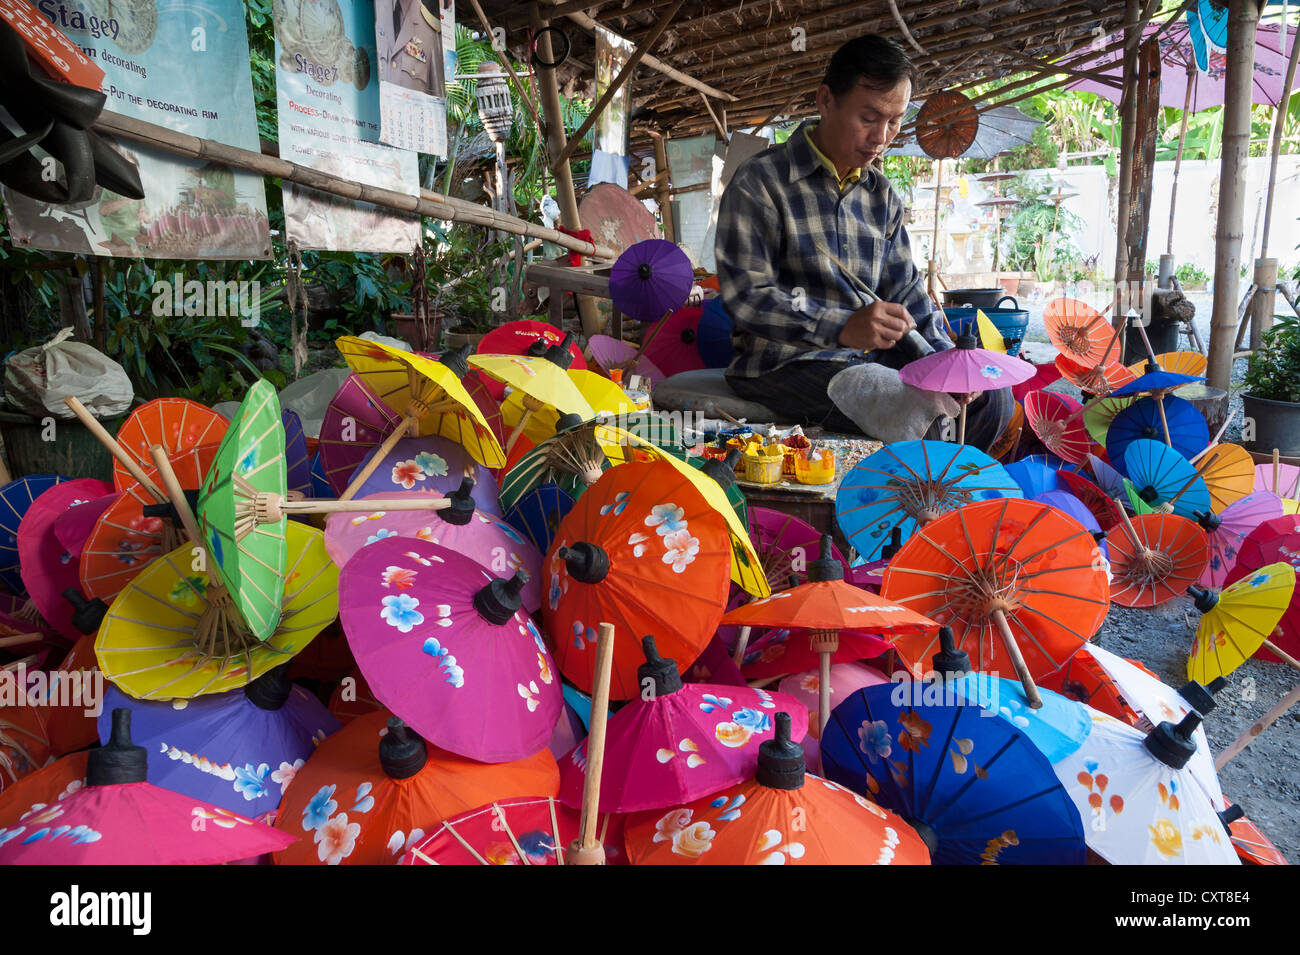 Handwerker produzieren ein buntes Papier Sonnenschirme, Bo Sang, Chiang Mai, Nord-Thailand, Thailand, Asien Stockbild